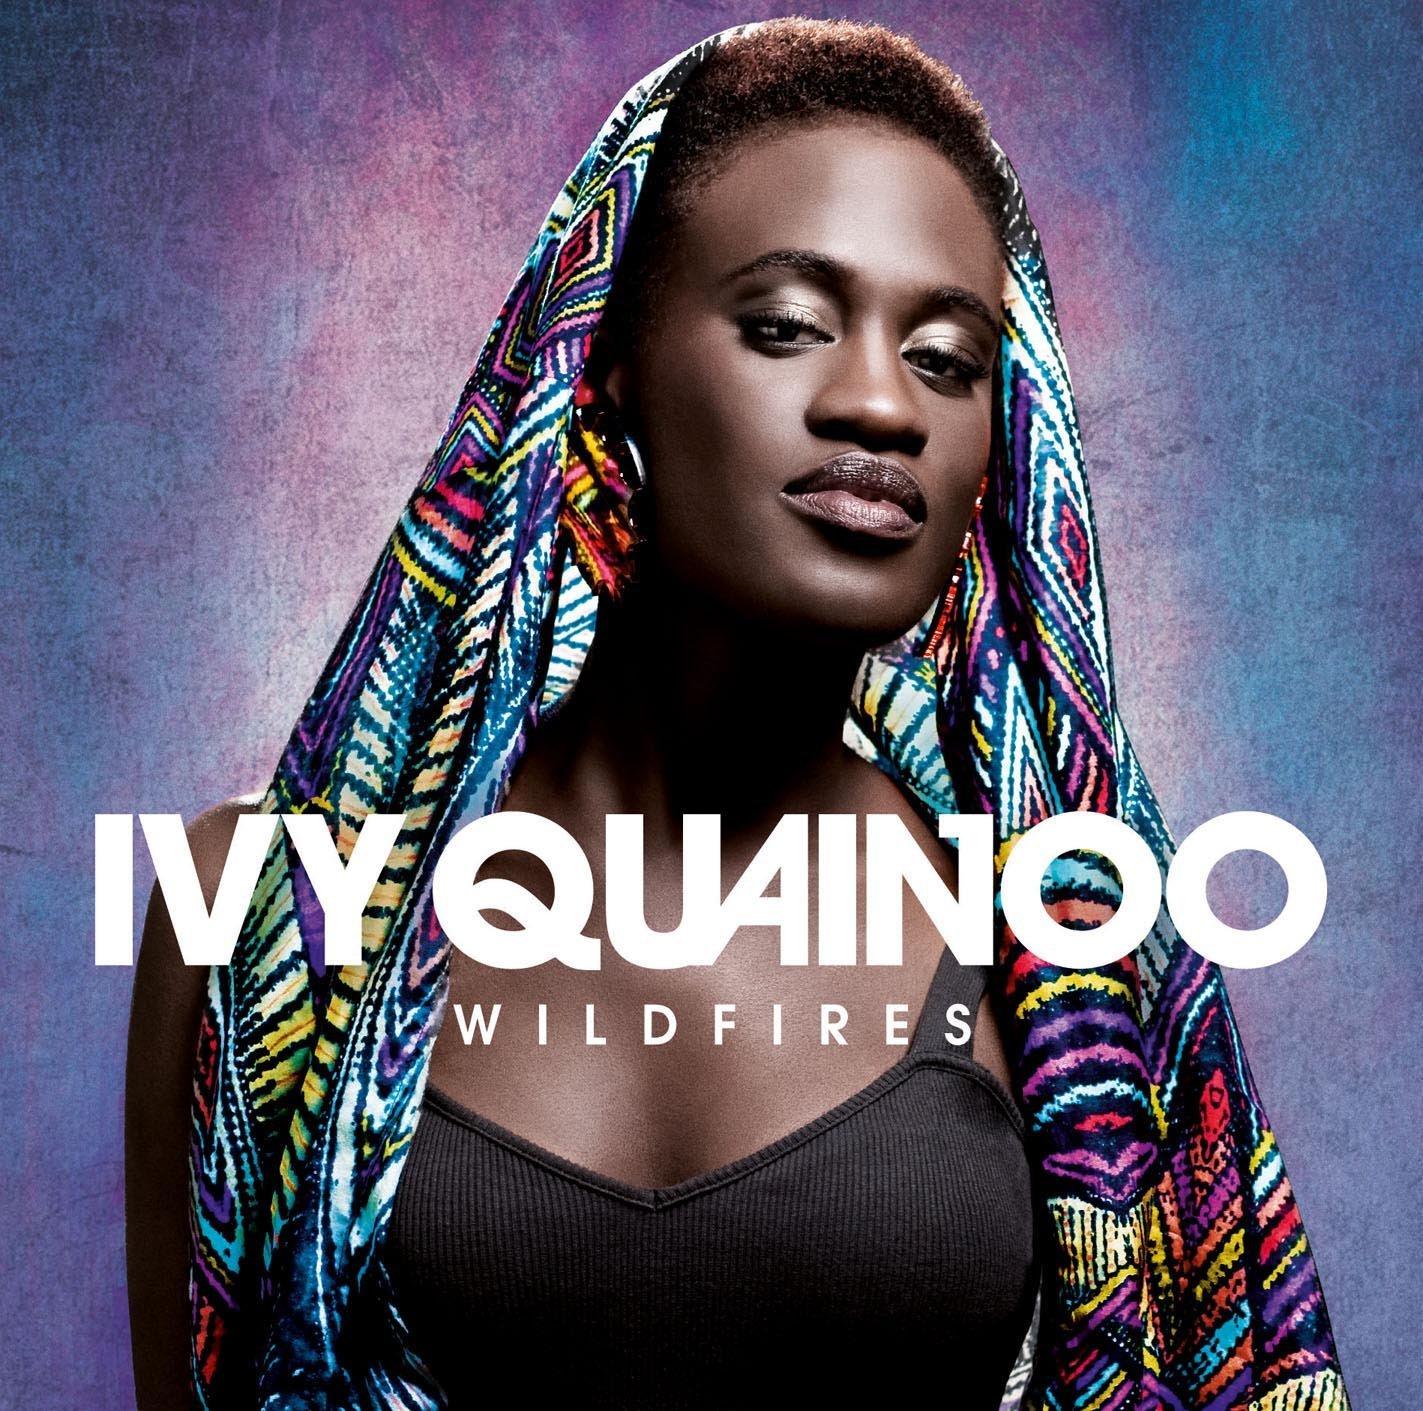 <strong>Ivy Quainoo</strong><br /> Wildfires (Album)